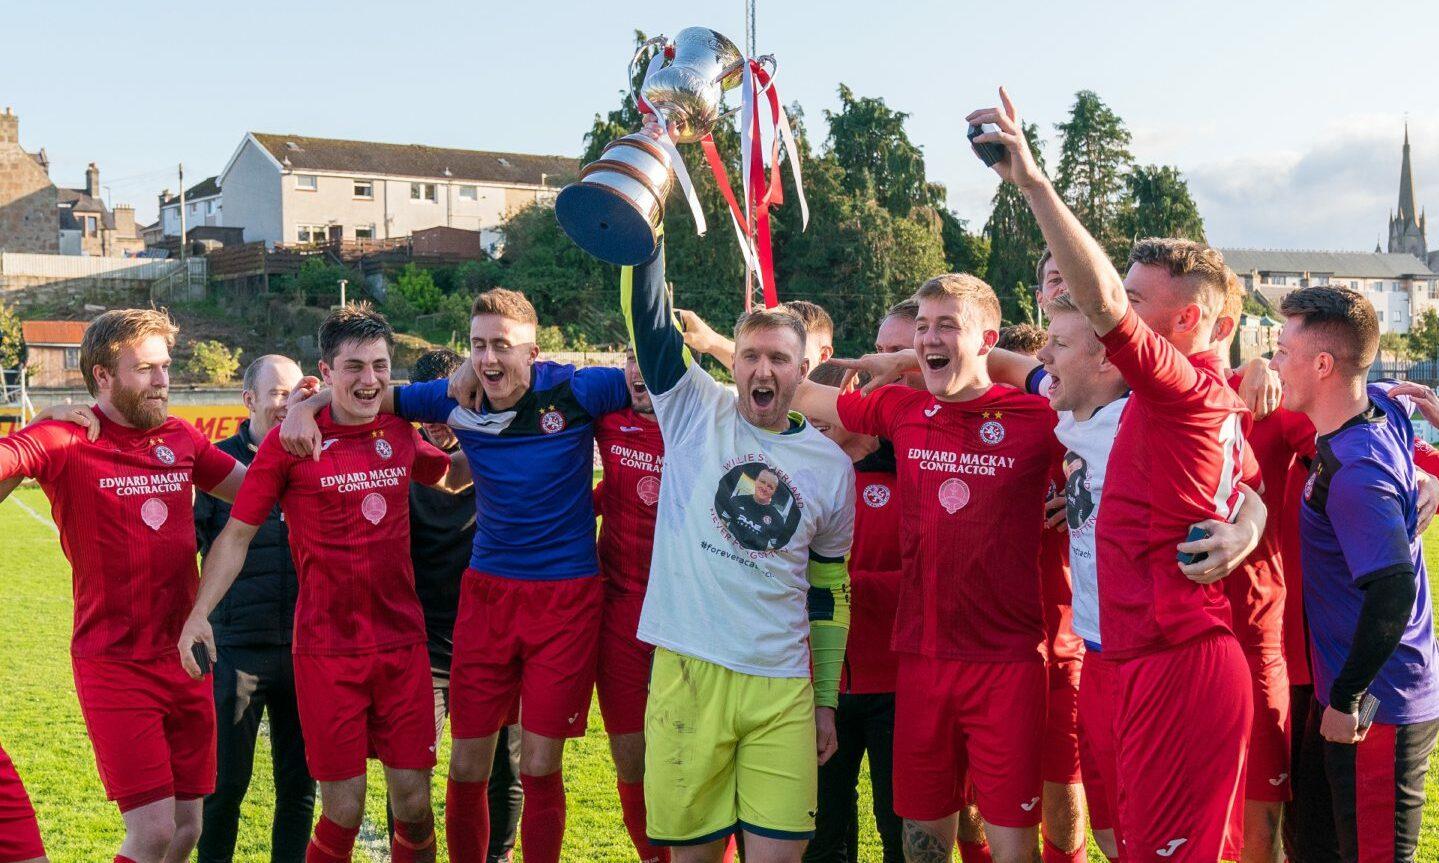 BRORA RANGERS FC V INVERNESS CT FC  NORTH OF SCOTLAND CUP FINAL 6 OCTOBER 2019 A9103238 32982939 e1624914189458.